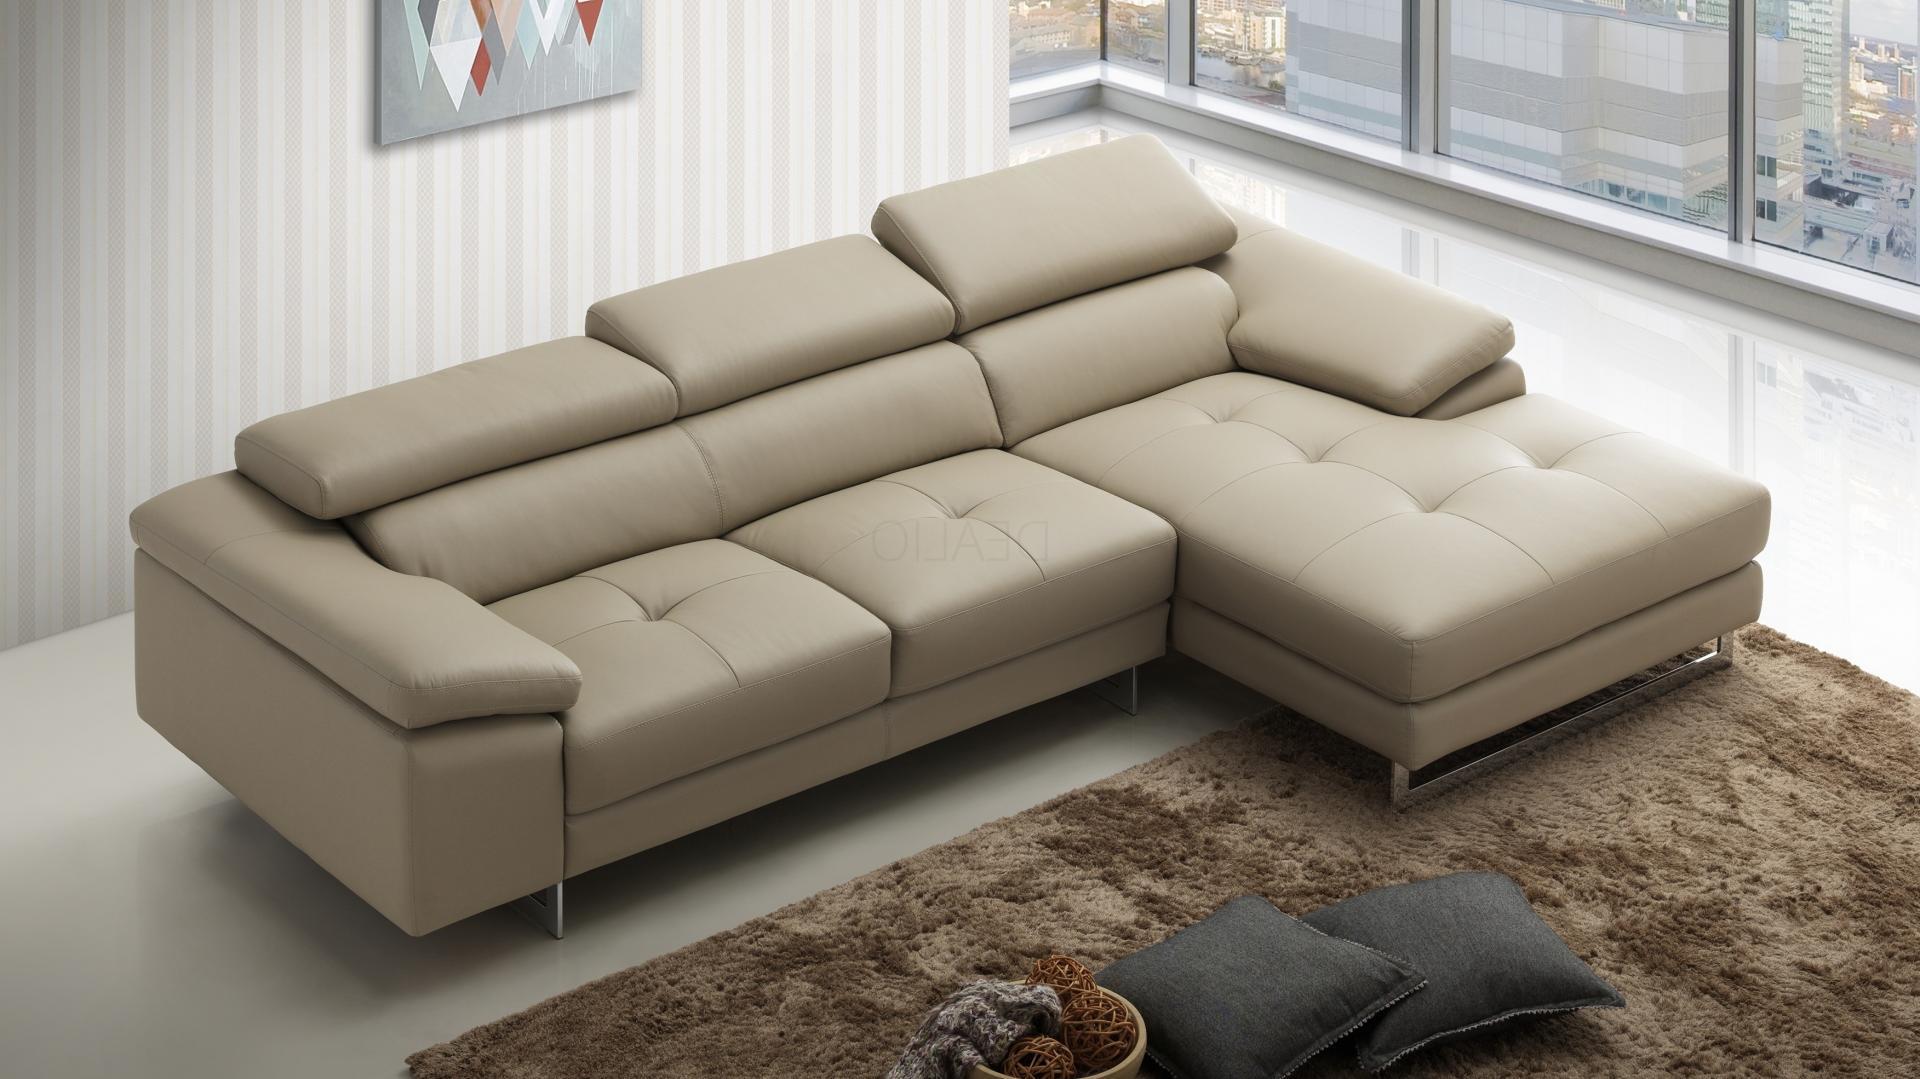 felix leather lh corner chaise sofa purple throw boston express lounge smoke life